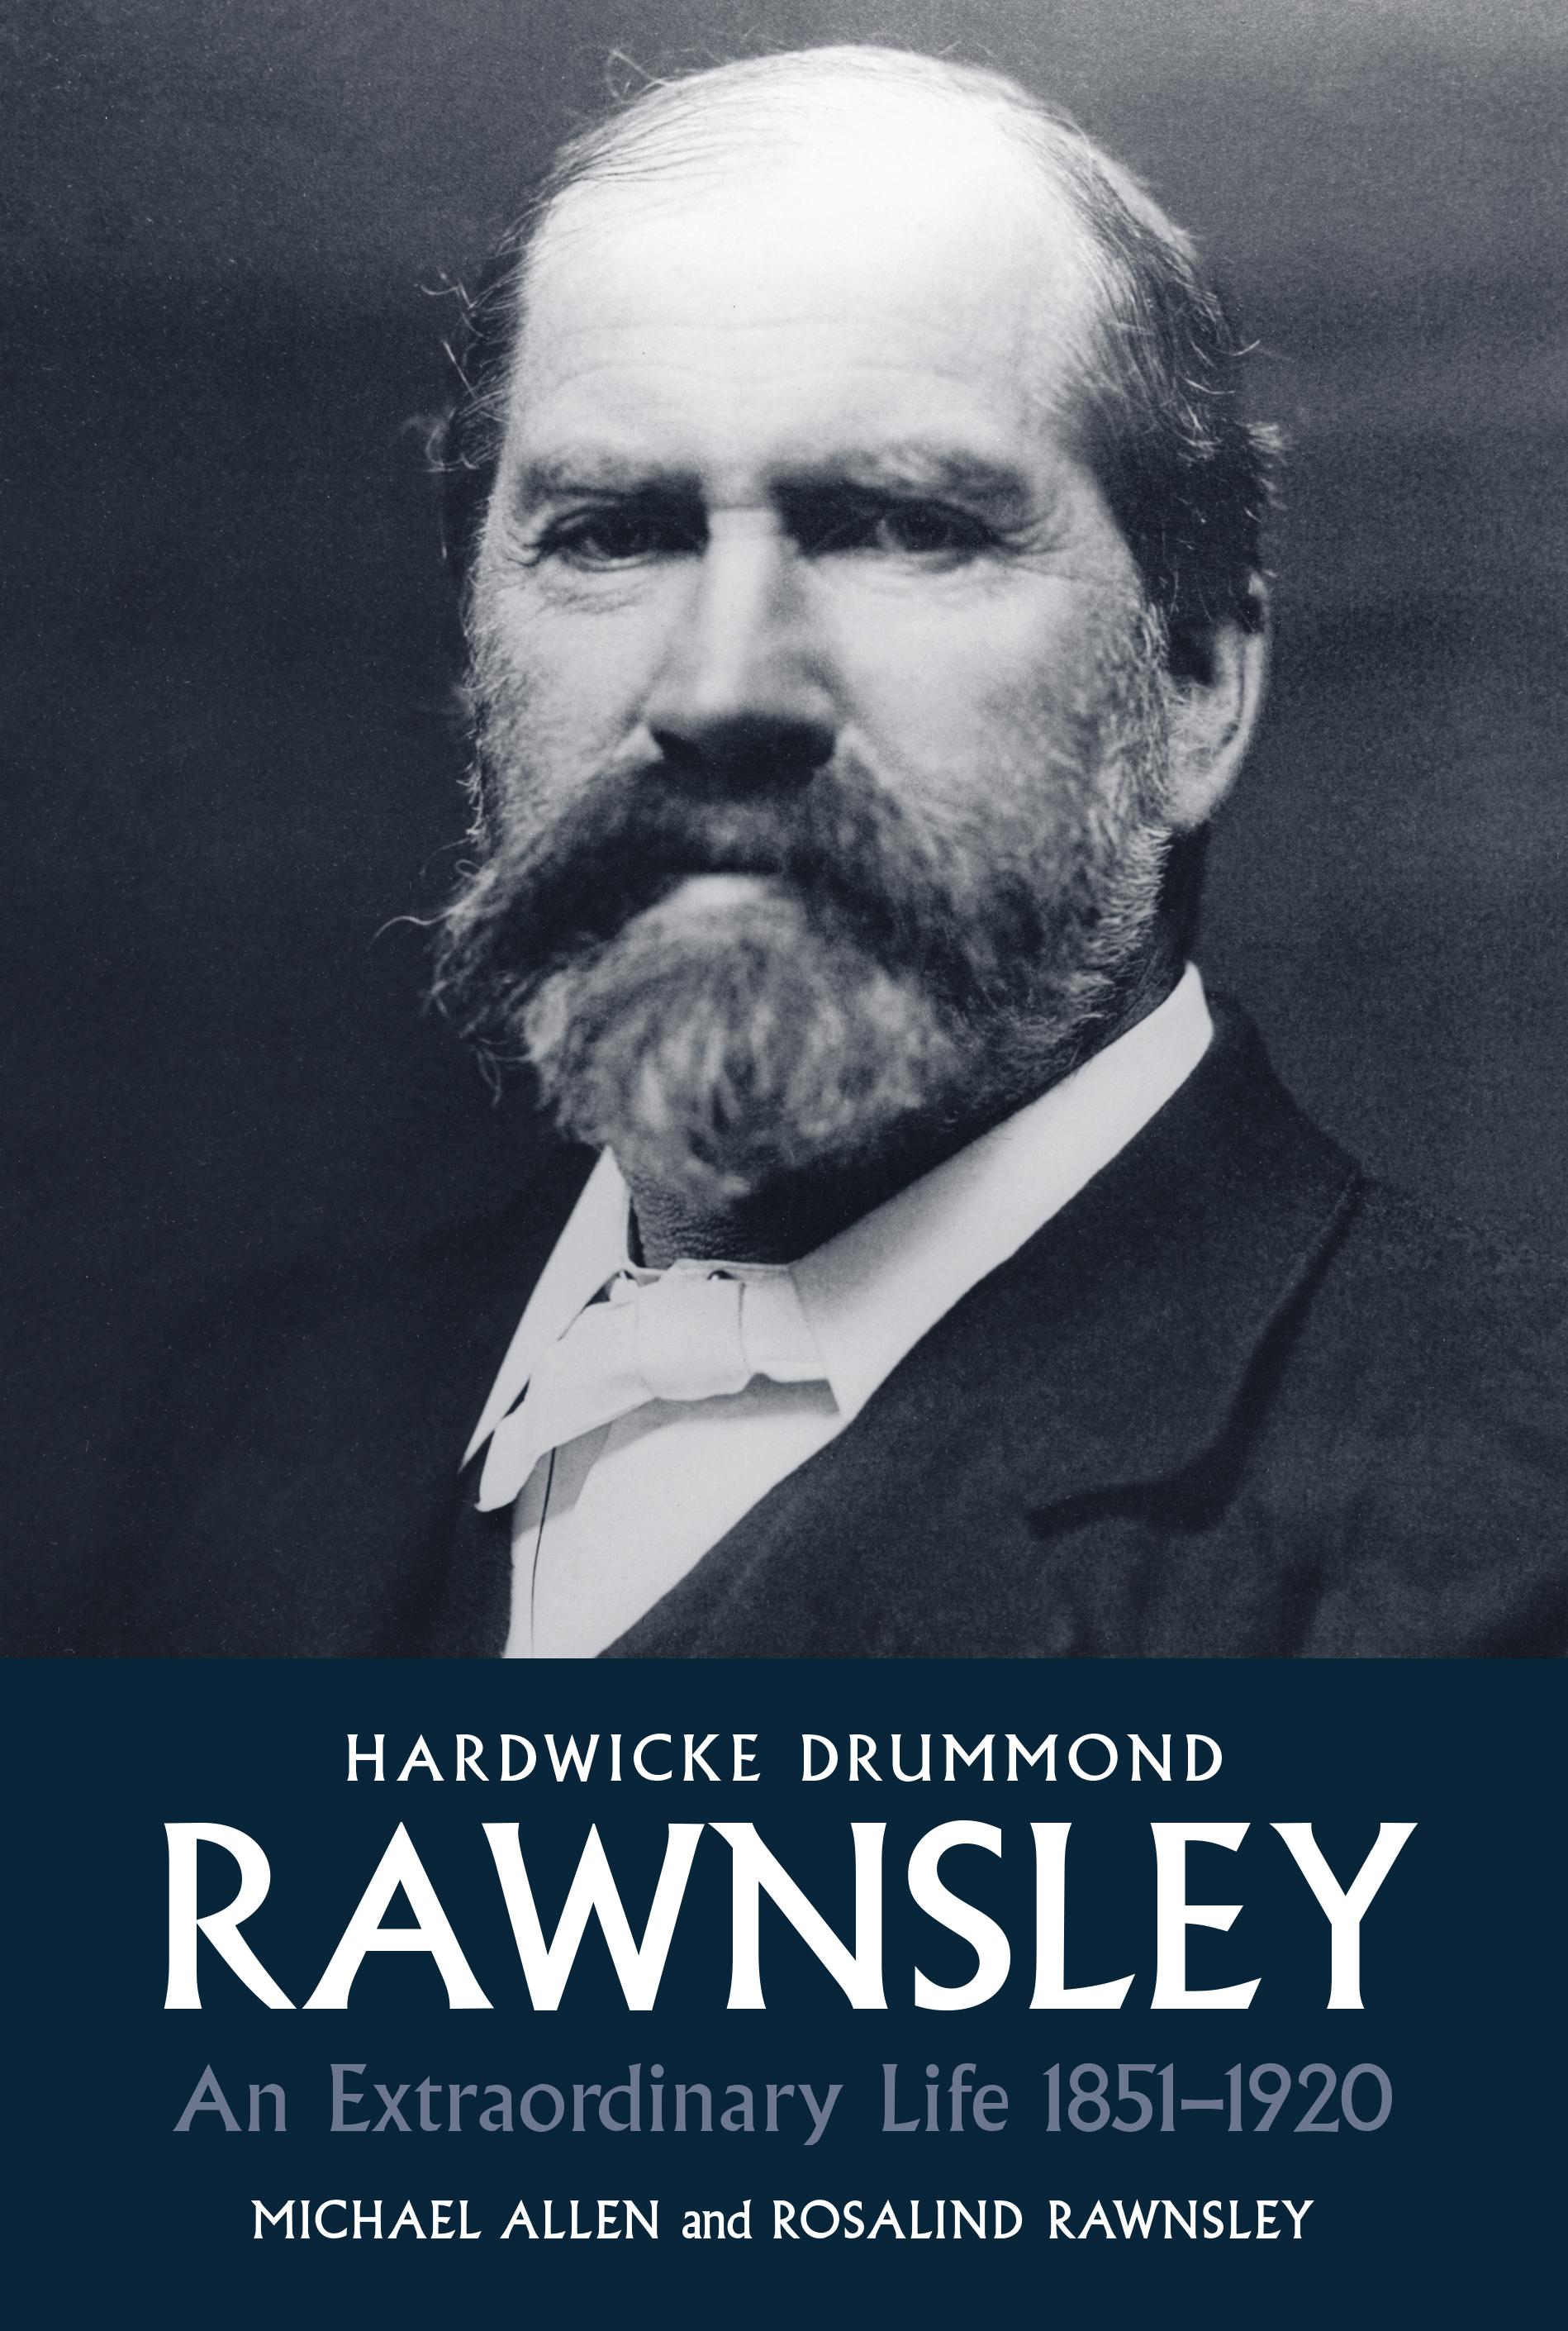 **PRE-ORDER A SIGNED COPY** Hardwicke Drummond Rawnsley; An Extraordinary Life 1851 - 1920